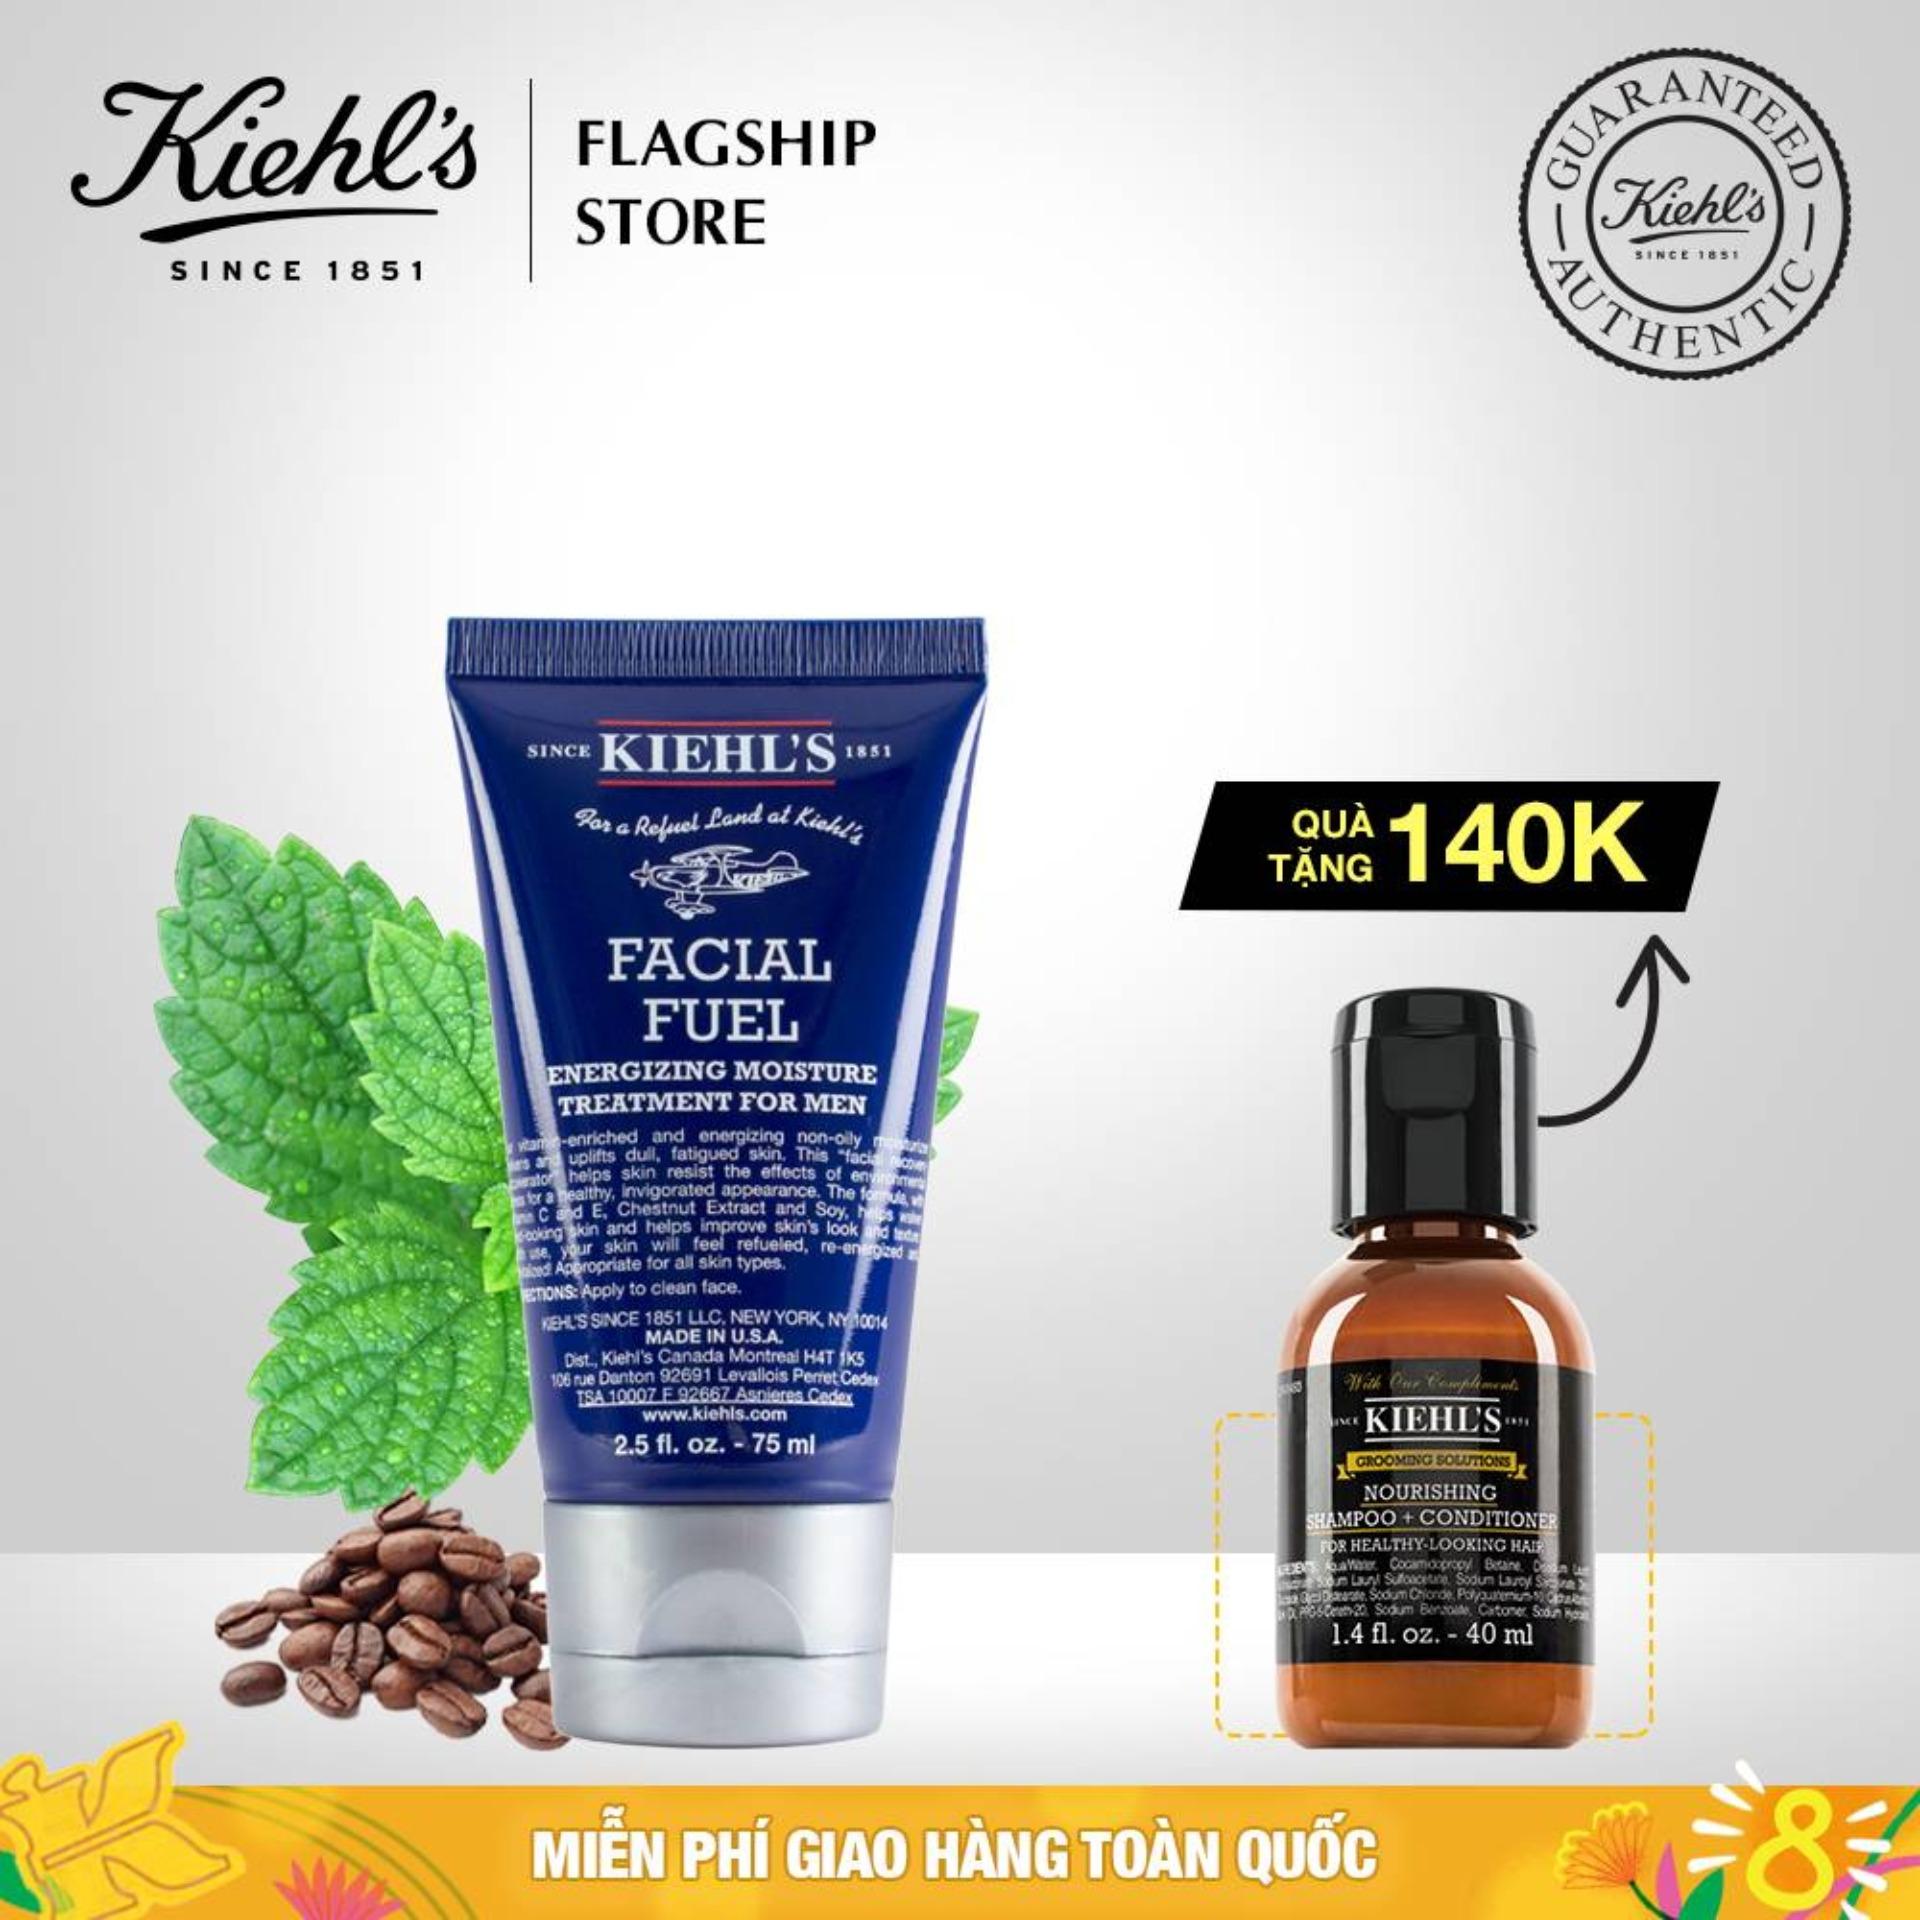 Kem Dưỡng Ẩm Cho Nam Kiehls Facial Fuel Energizing Moisture Treatment For Men 75ML cao cấp